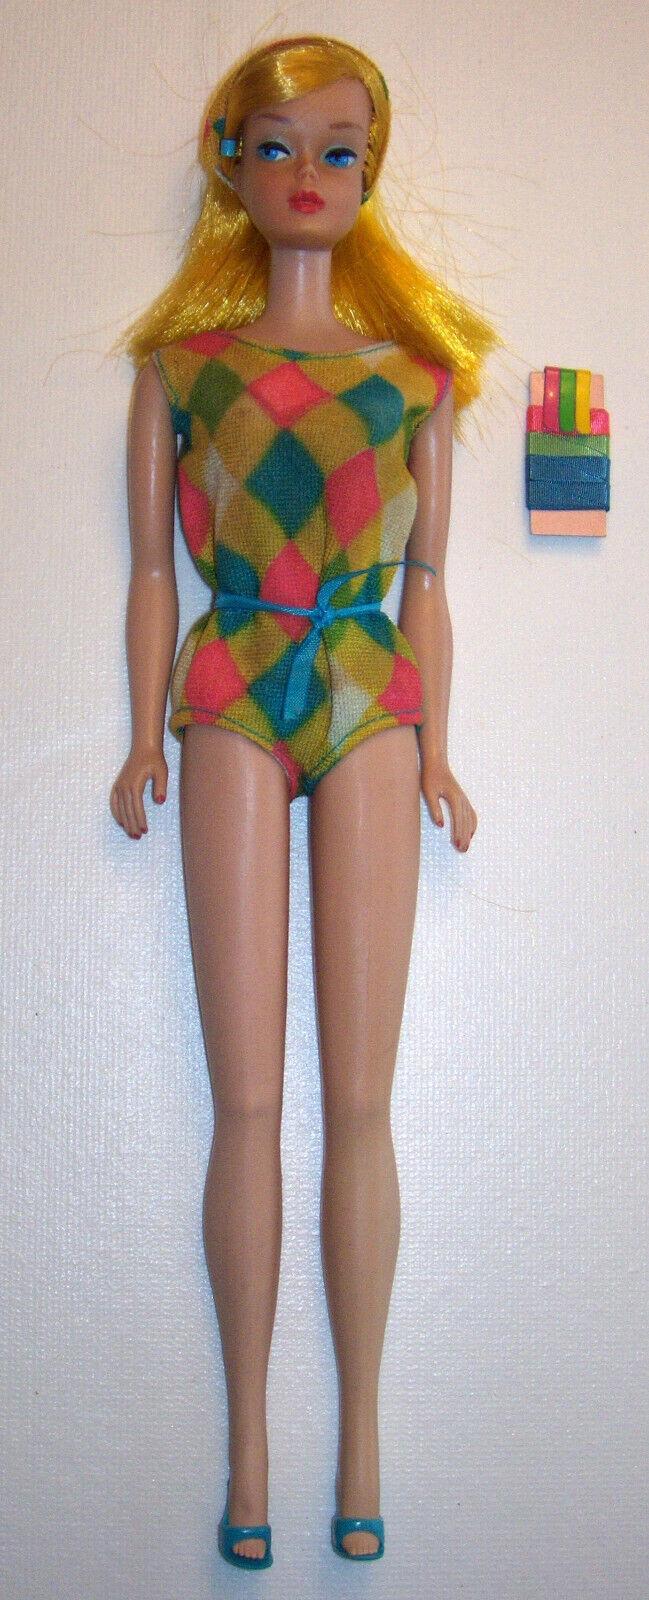 Vintage  1150 Biondo Dorato Coloree Magic Bambola Barbie Bl 1966-1967 Oss Nastri